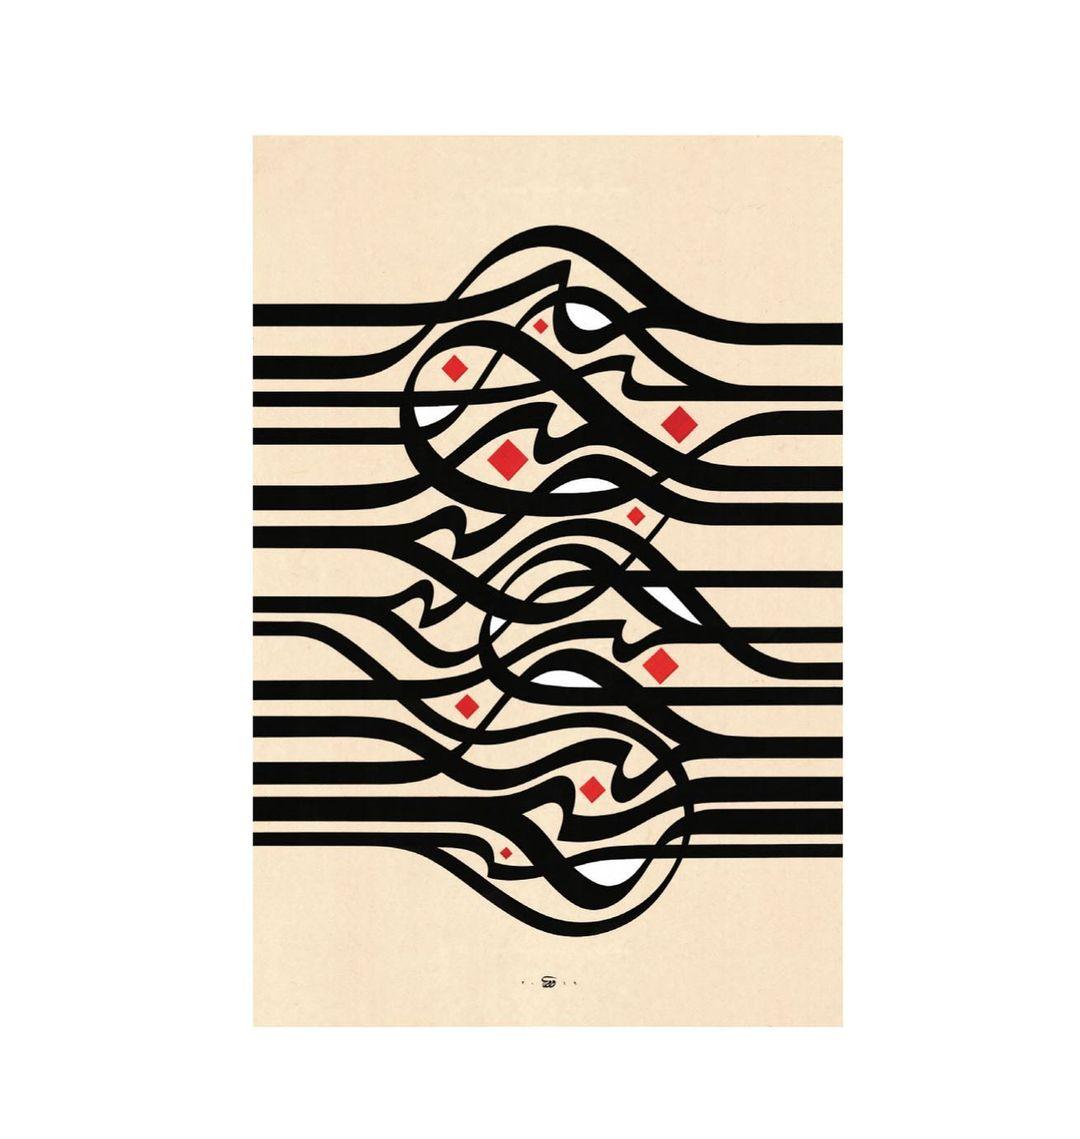 Download Kaligrafi Karya Kaligrafer Kristen Maze ! #wissamshawkat #art #wissam_shawkat #design #mestariagallery #arabiccalli...-Wissam 1